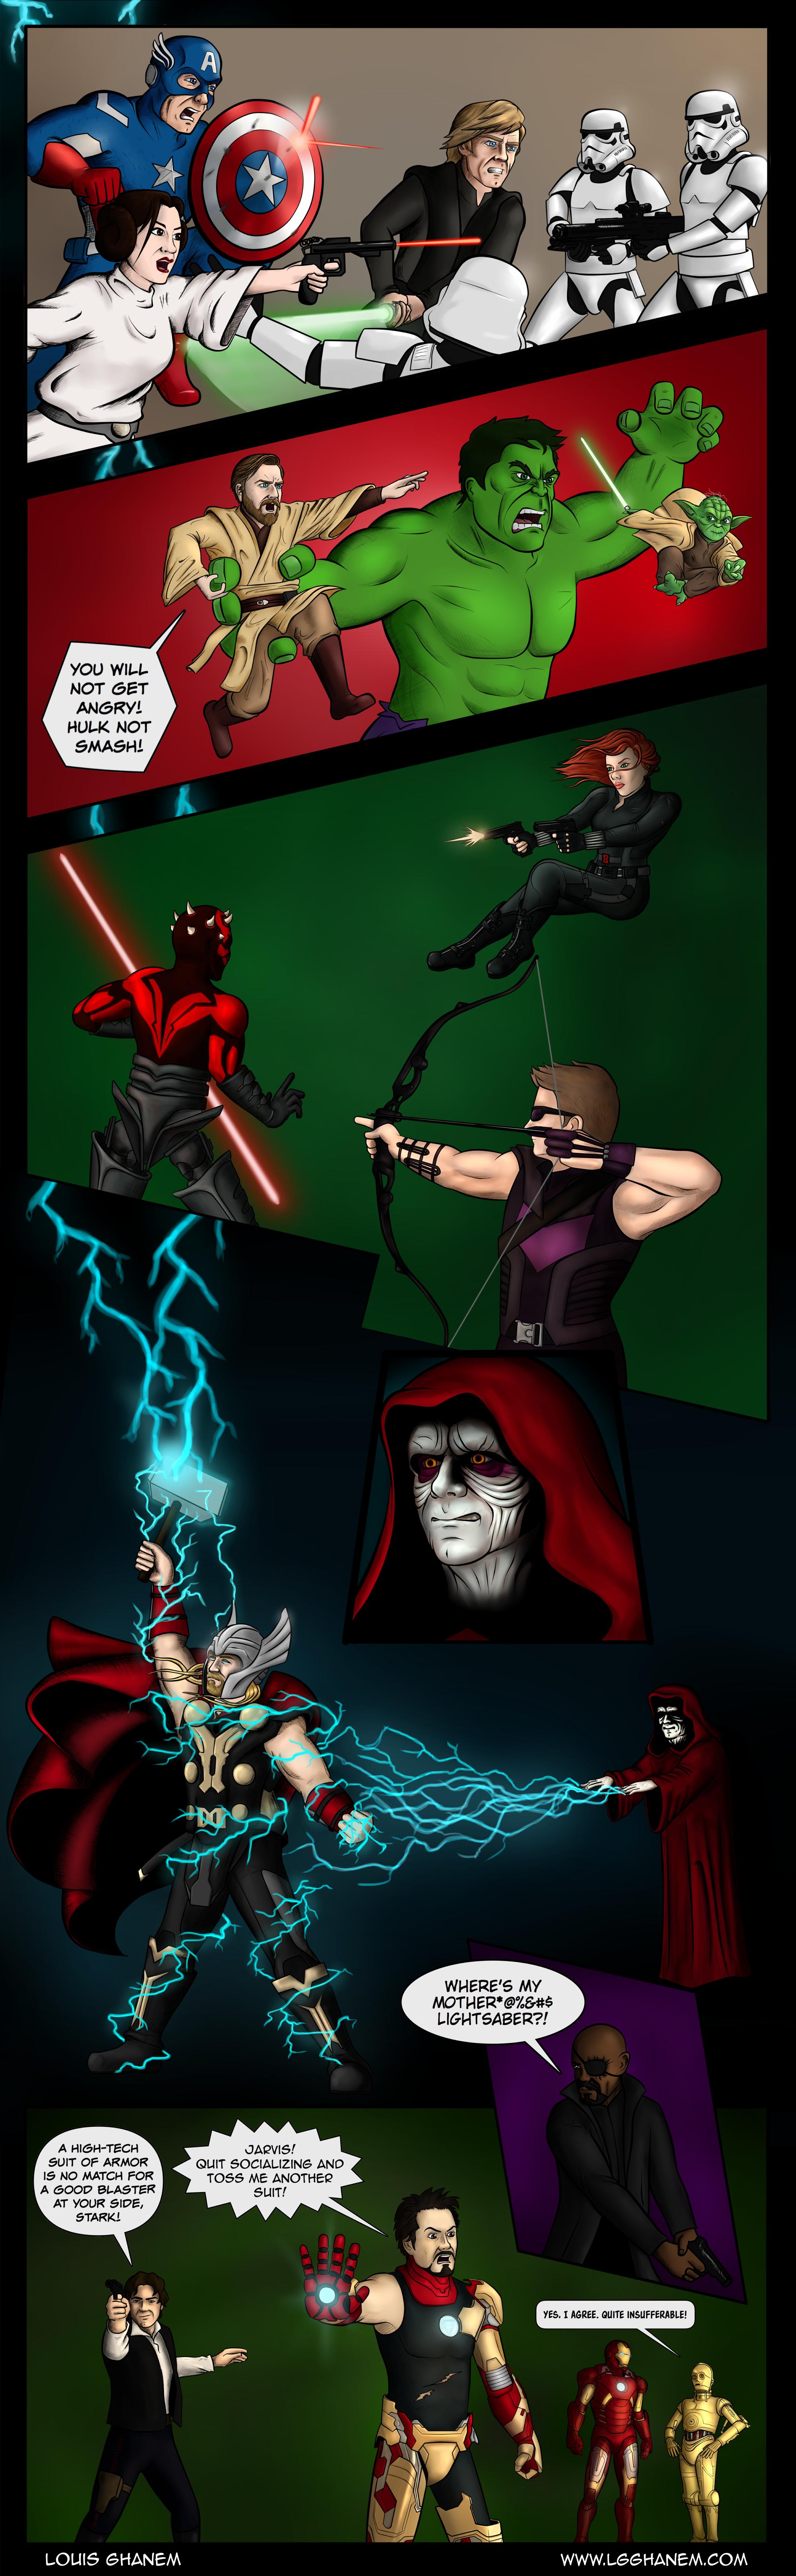 Marvel Vs Star Wars Avengers Edition Scrawl Space Vingadores Marvel Herois